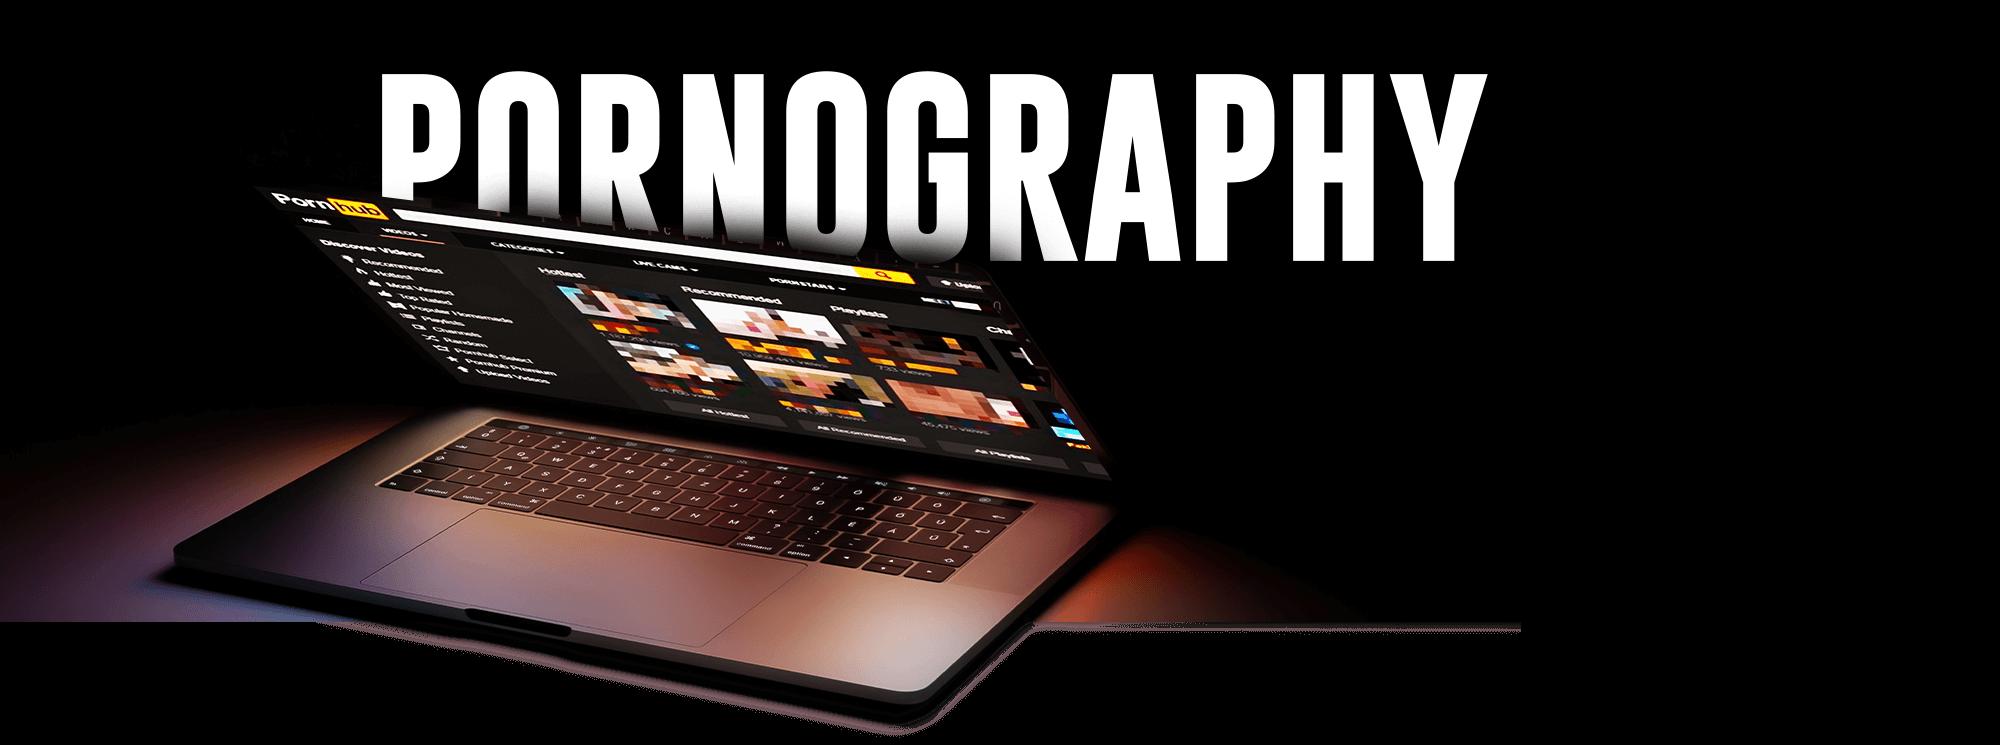 Pornography Issue Header